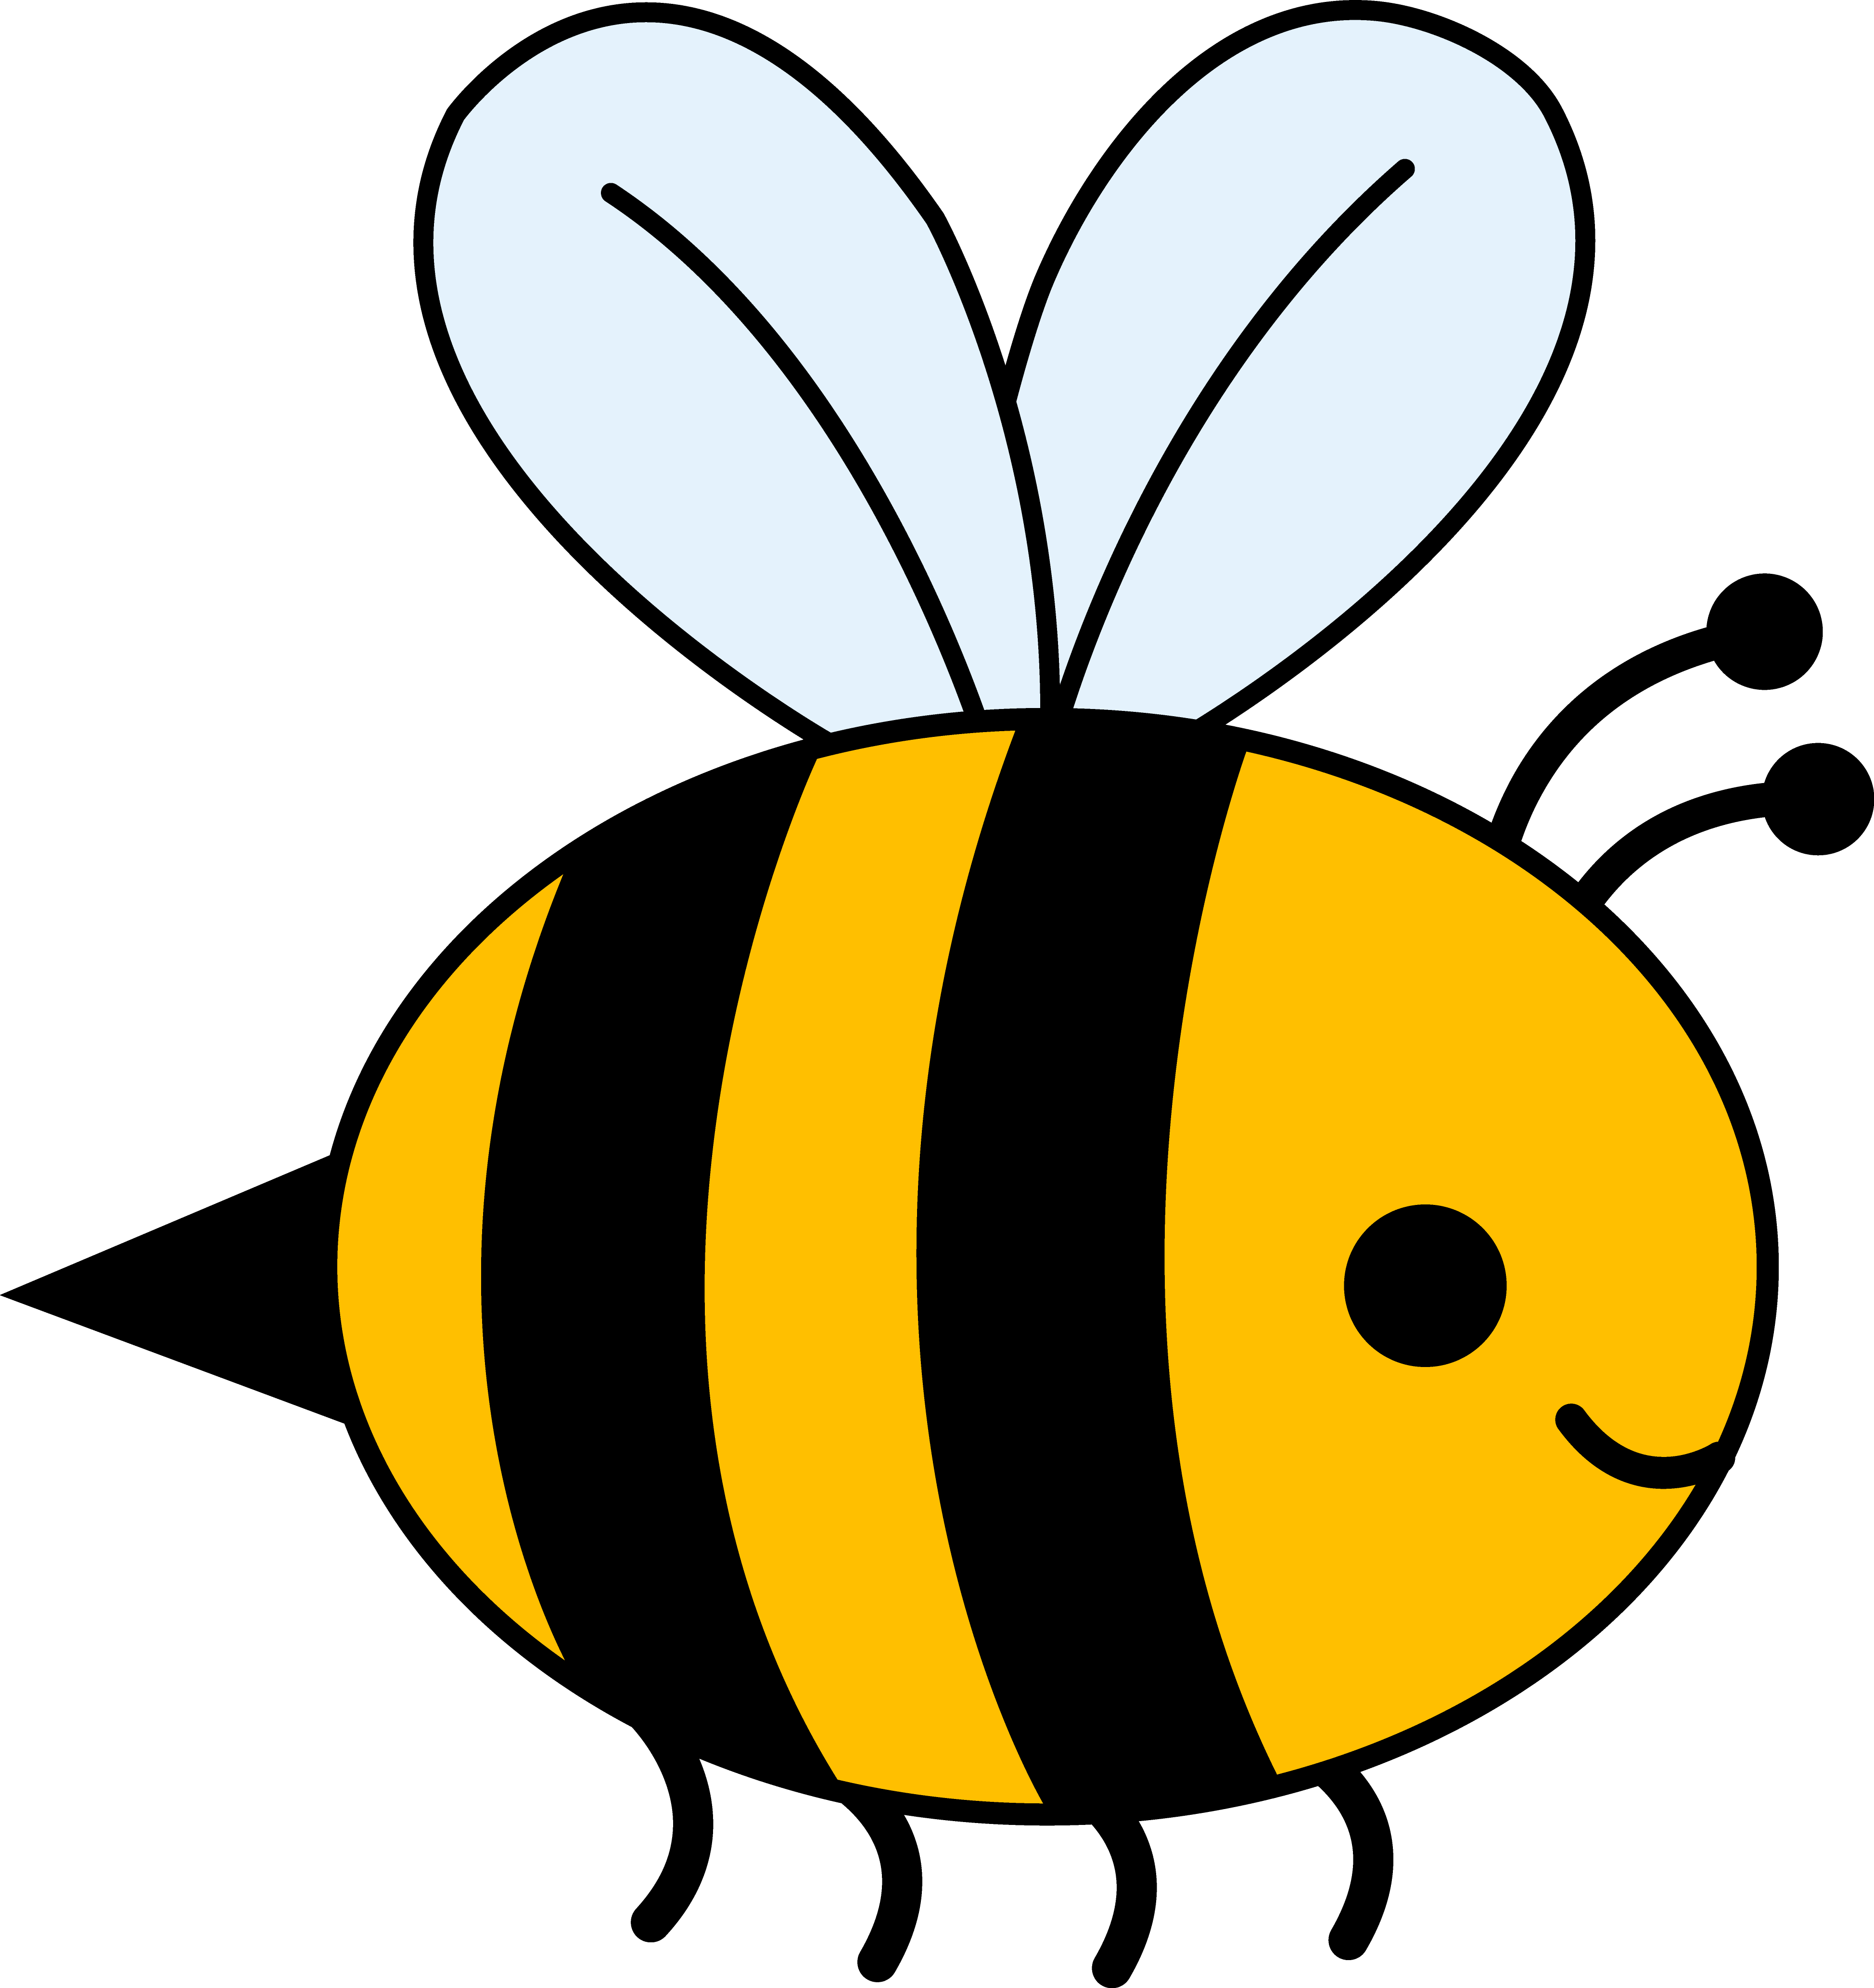 Bumble bee cute bee clip art love bees cartoon clip art more clip